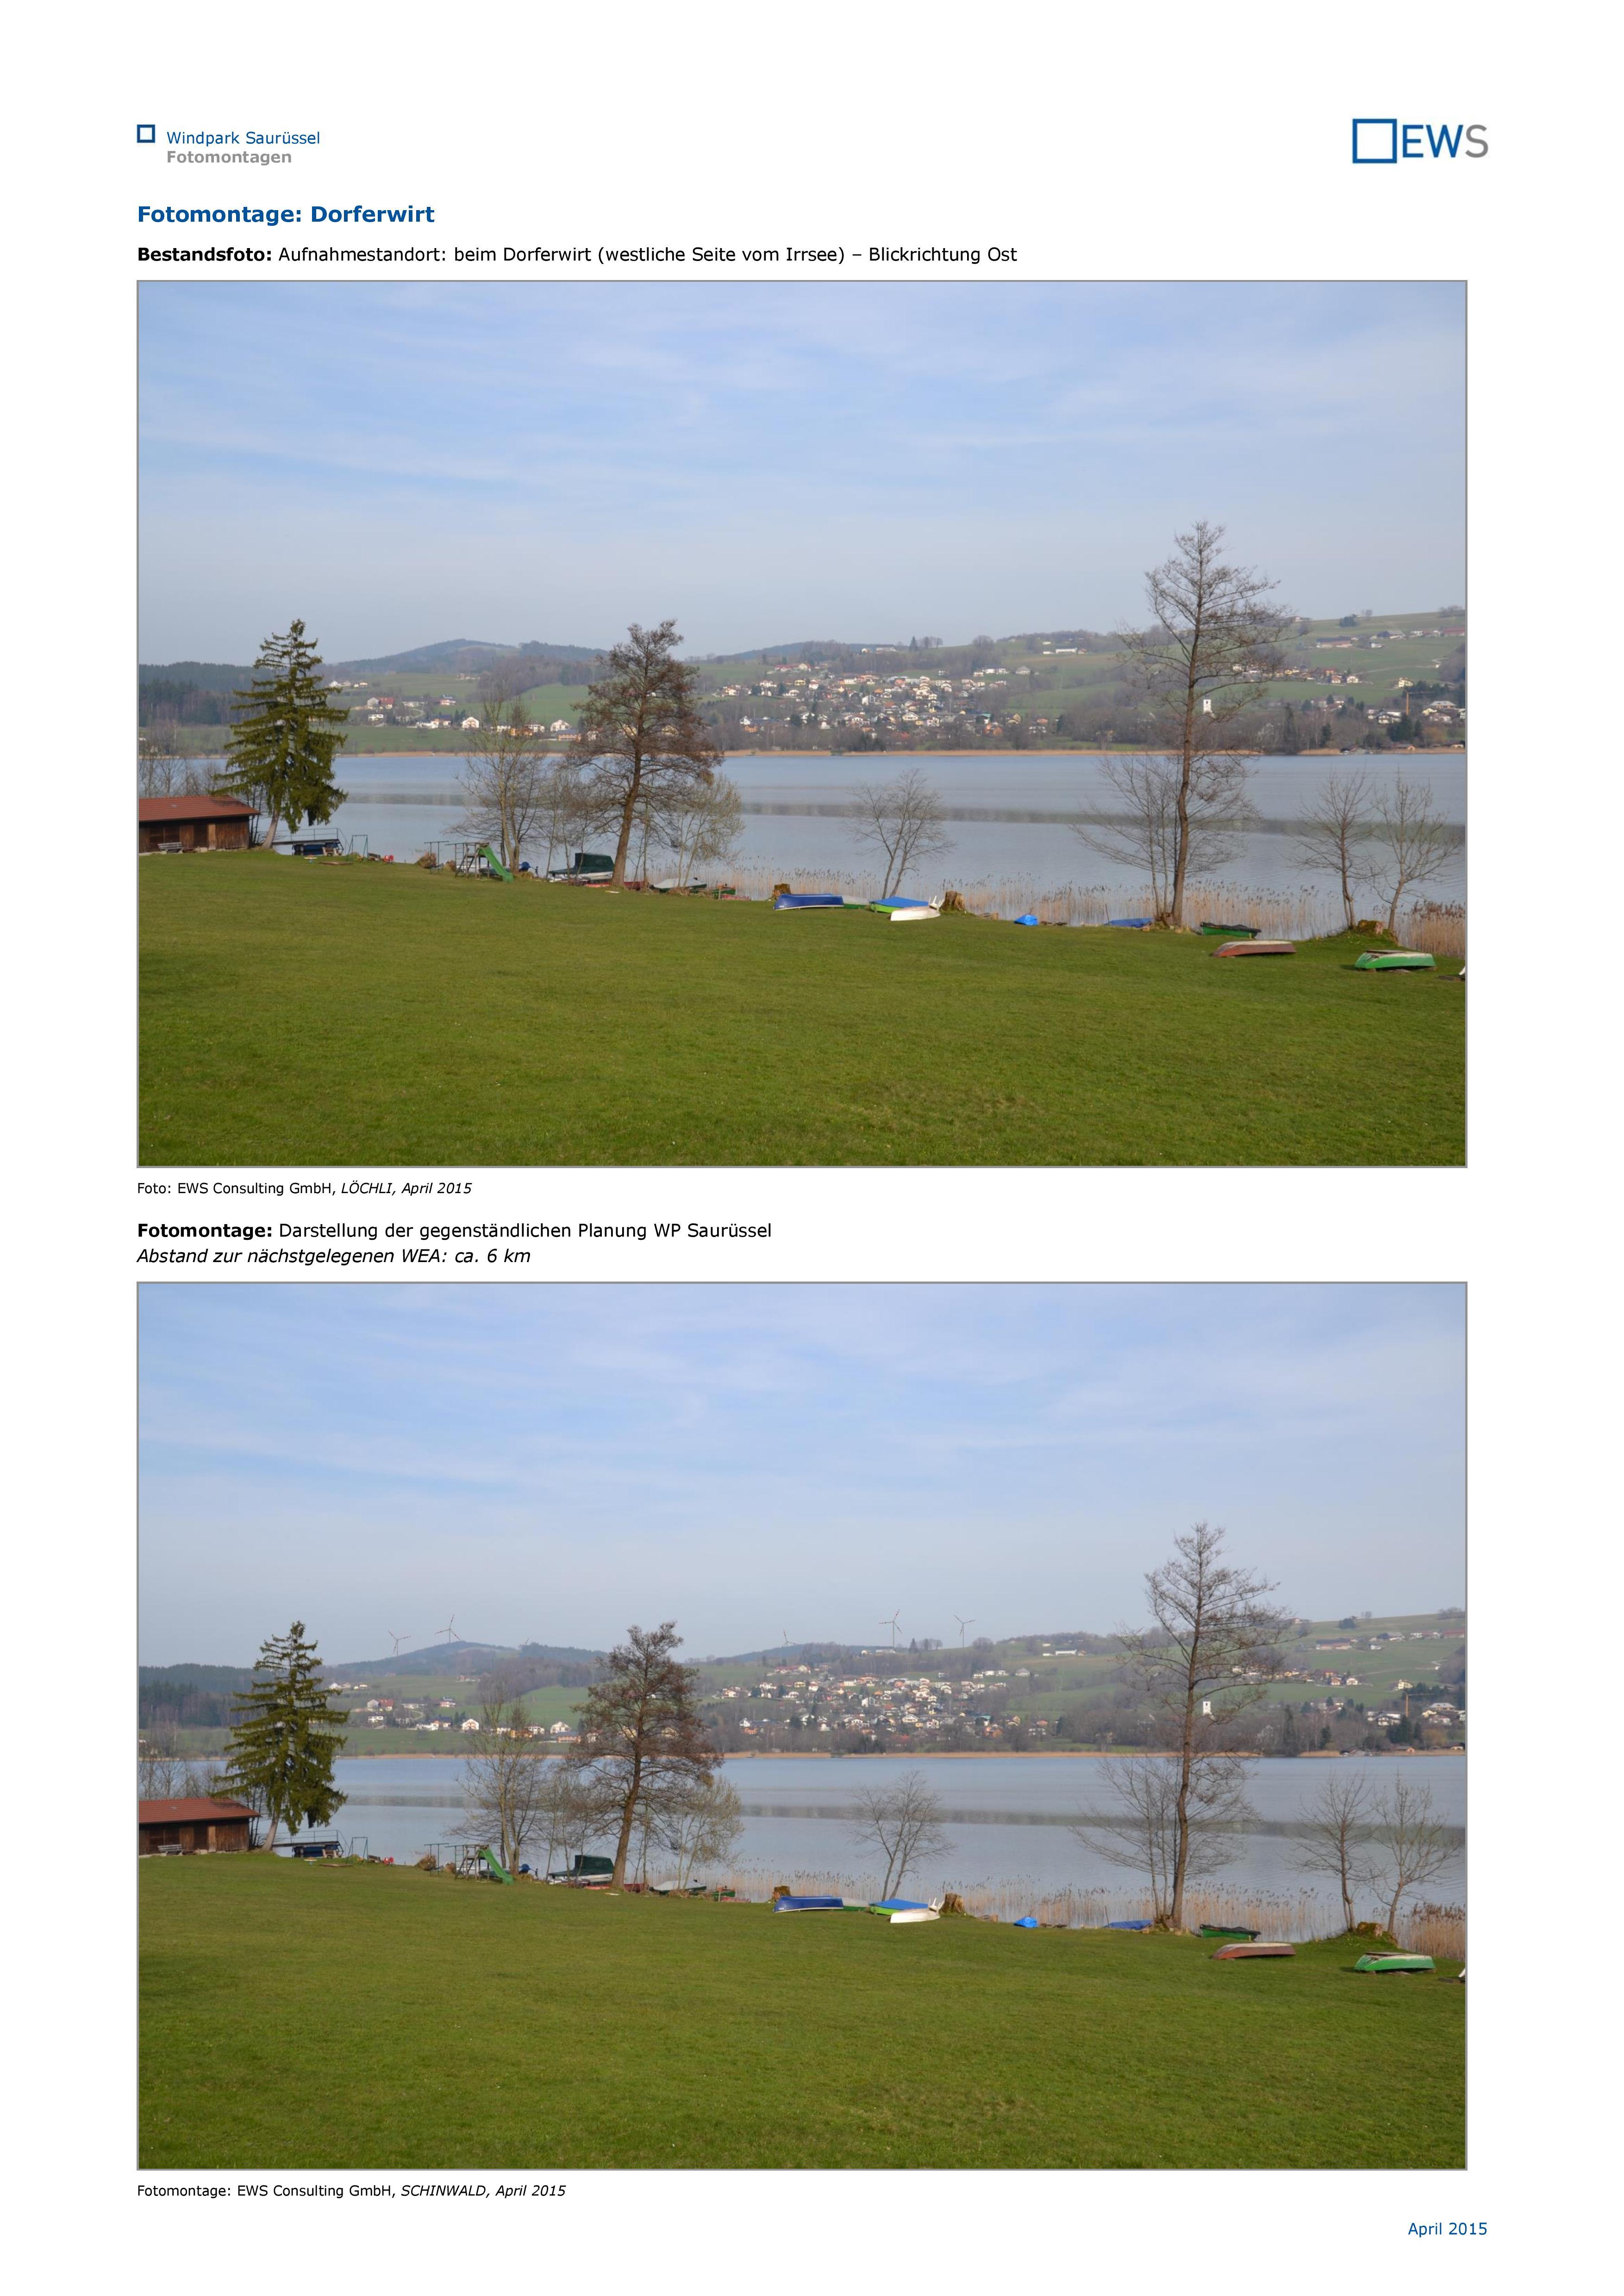 fm_dorferwirt_a3-page-001 (2)